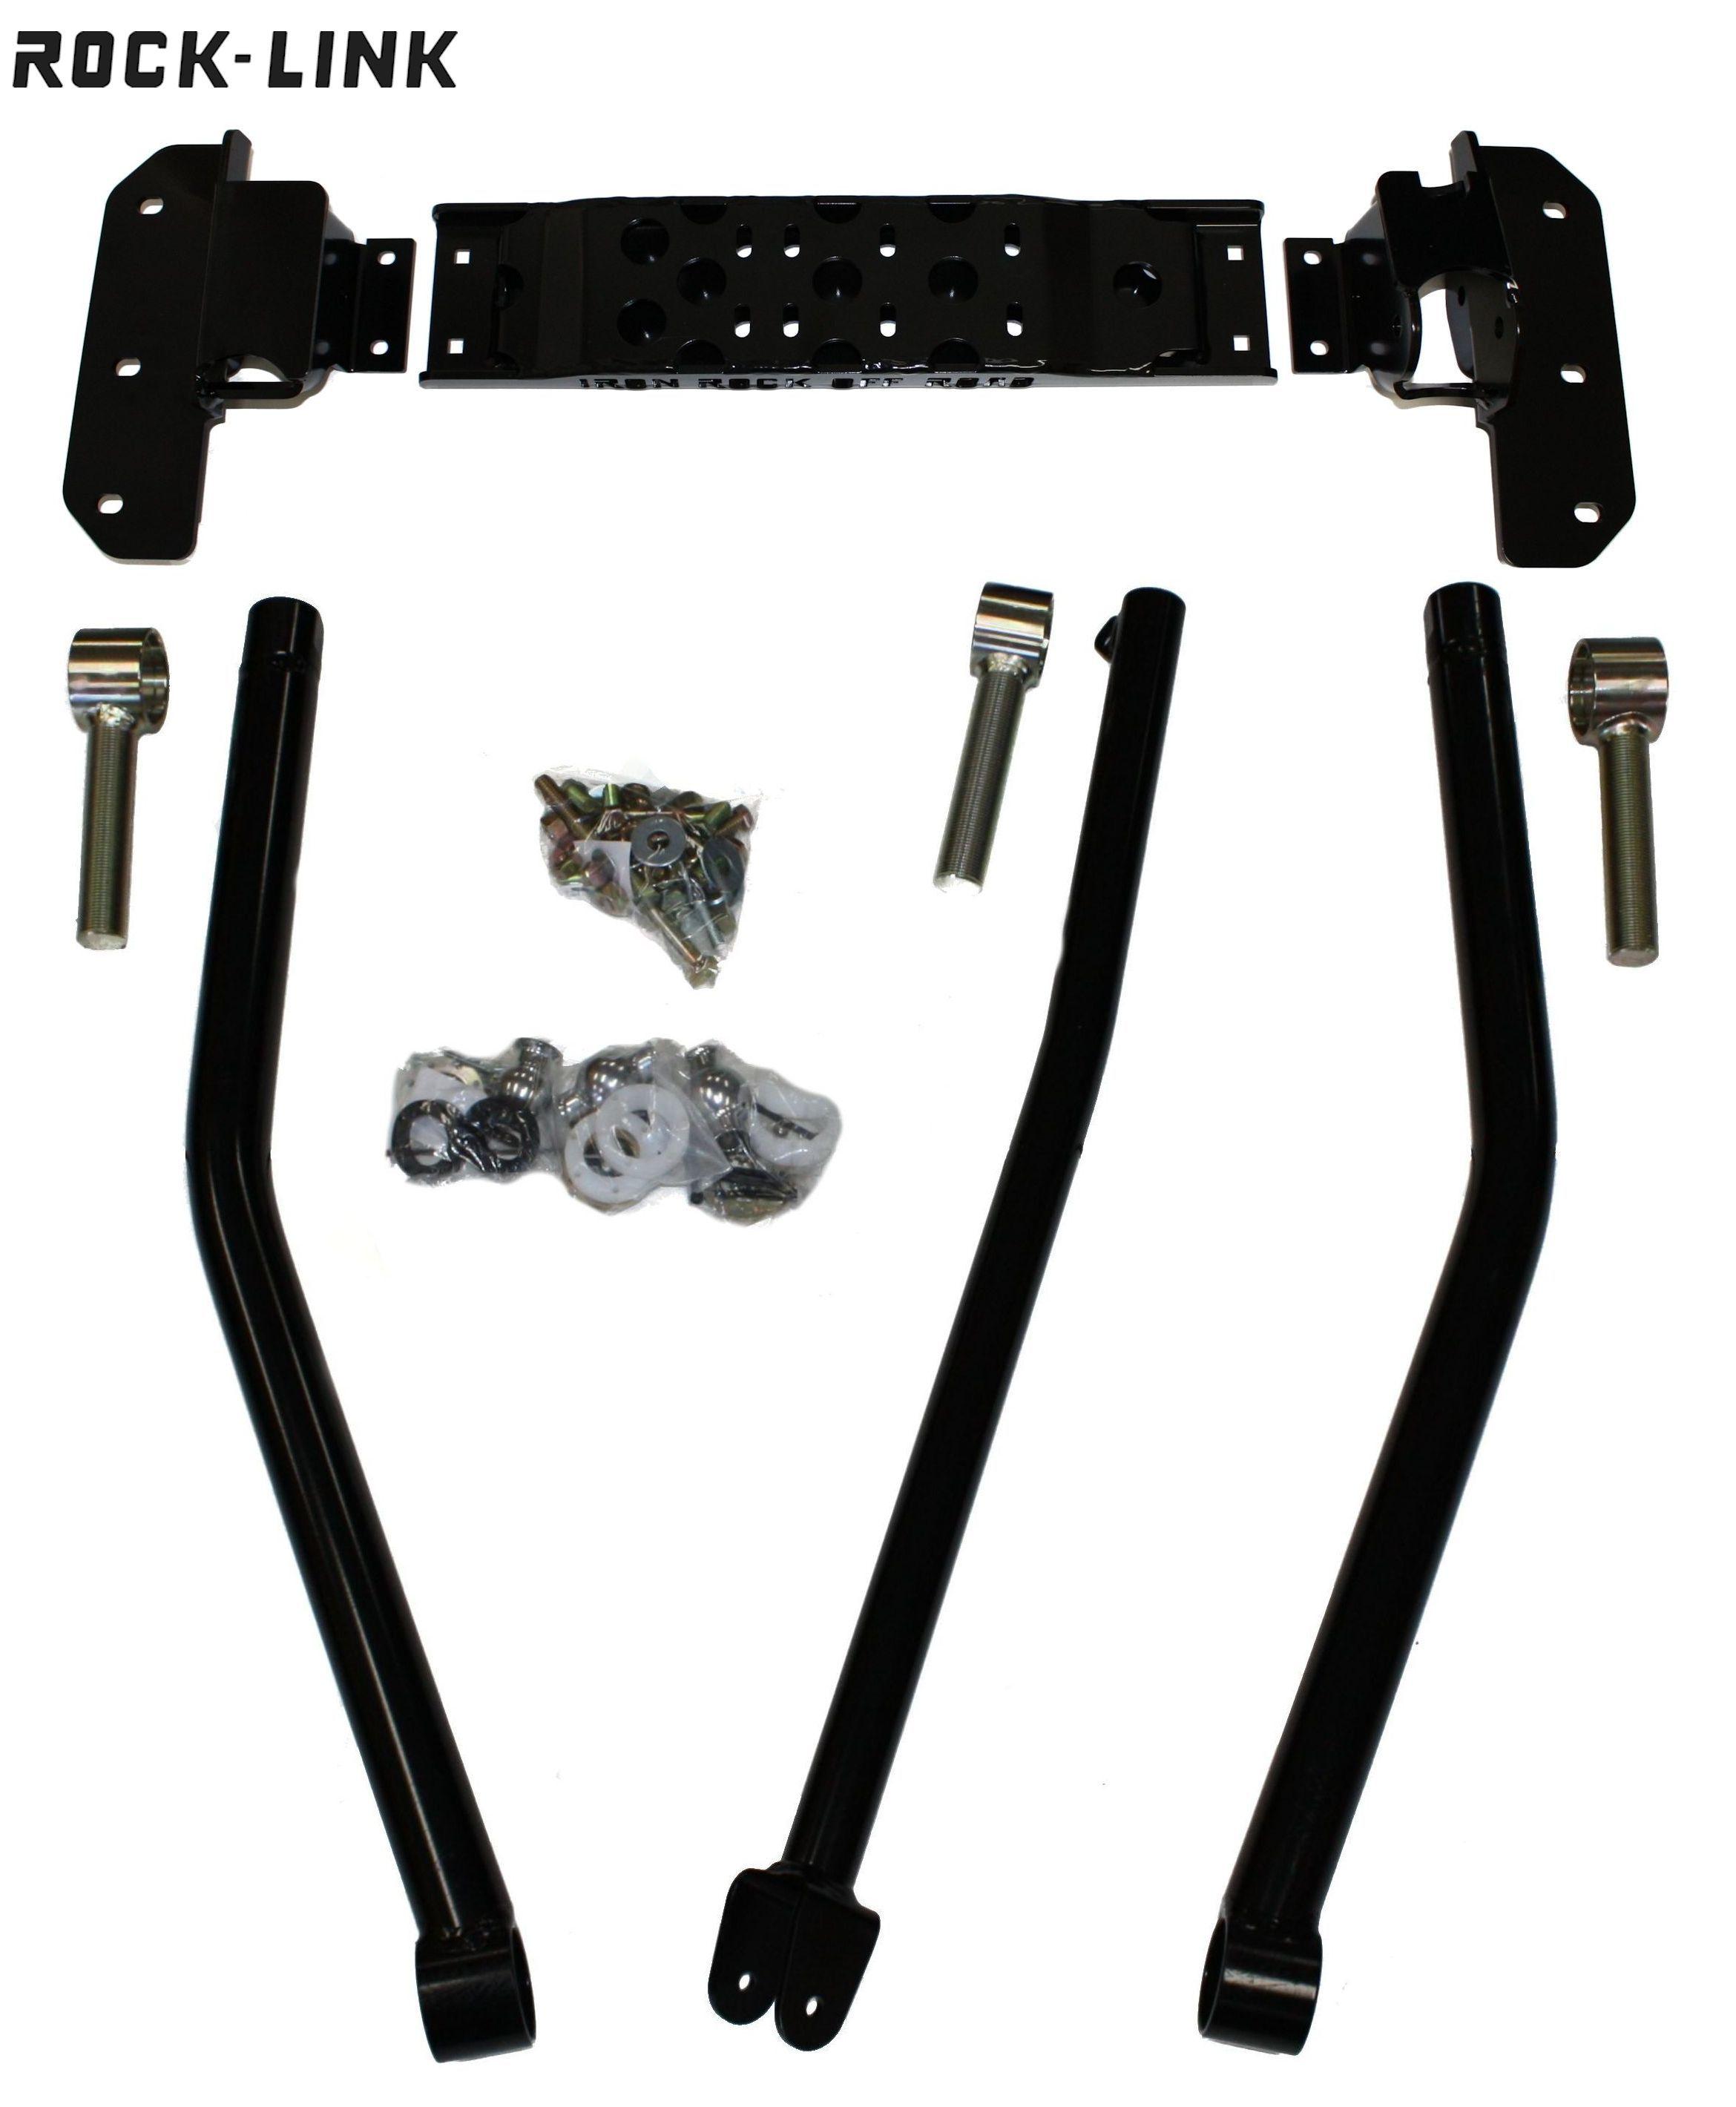 Xj Rock Link Front Long Arm Upgrade Rock Frame Jeep Xj